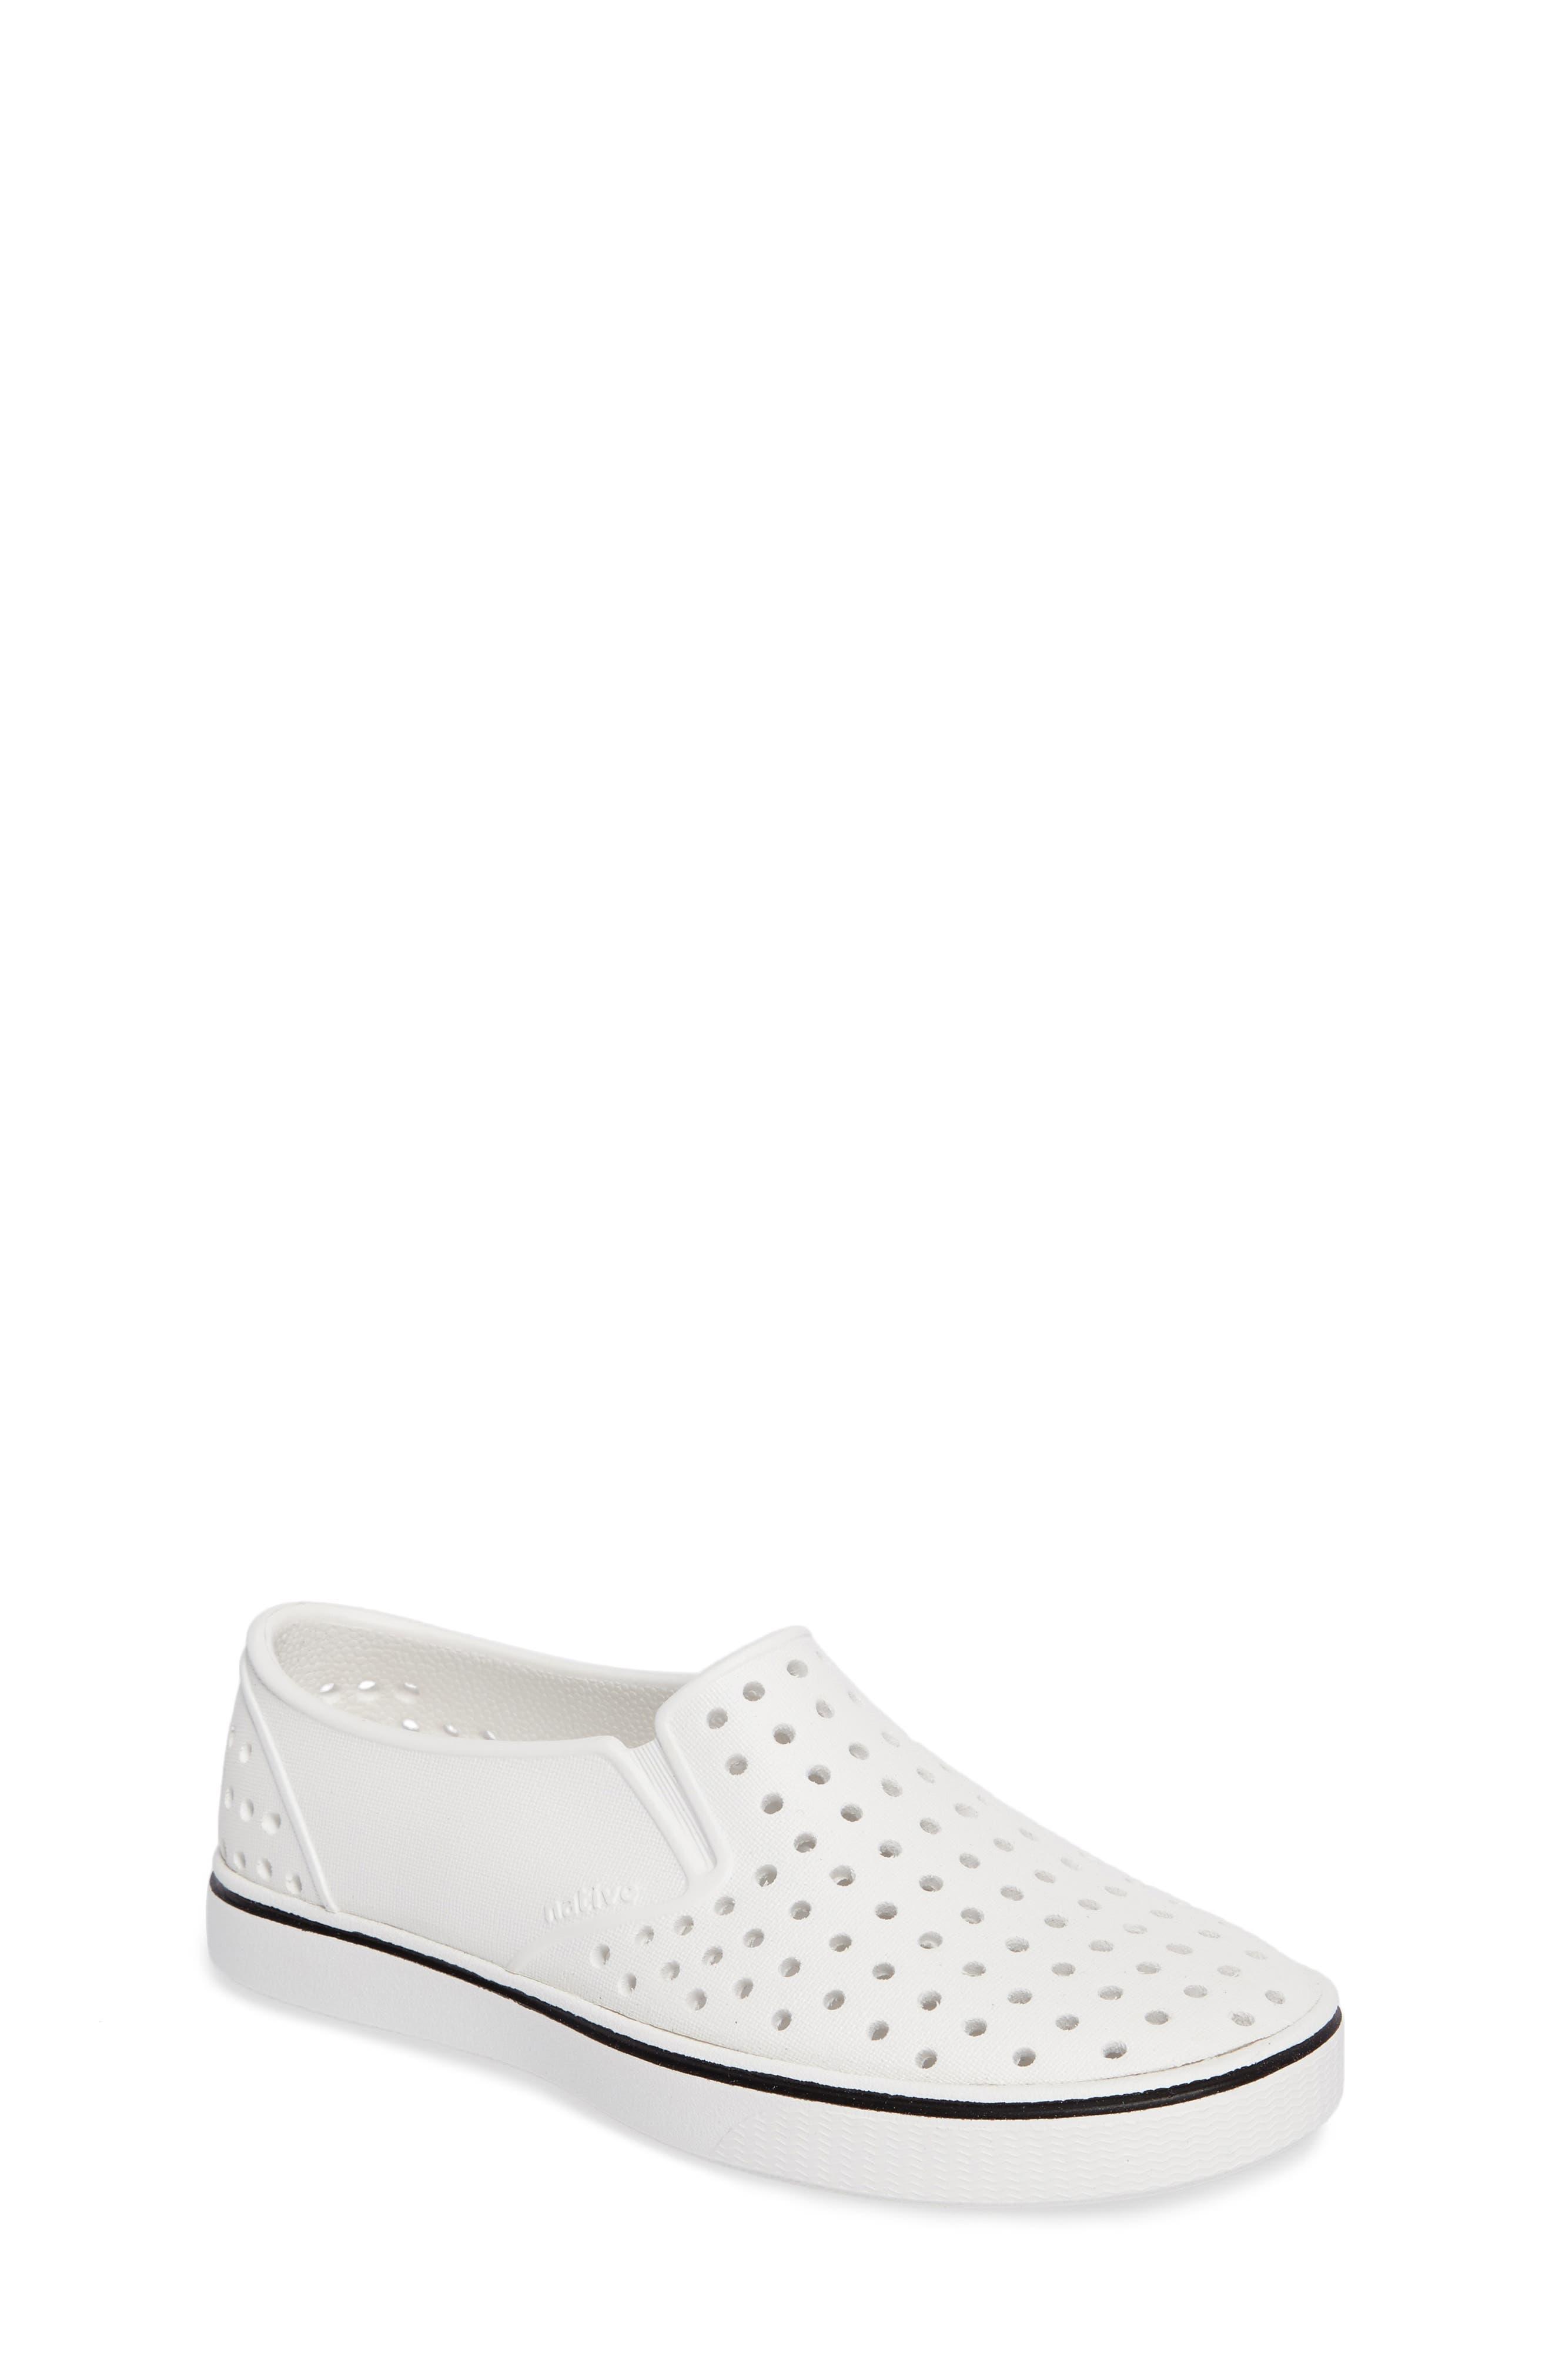 Miles Water Friendly Slip-On Sneaker,                             Main thumbnail 1, color,                             SHELL WHITE